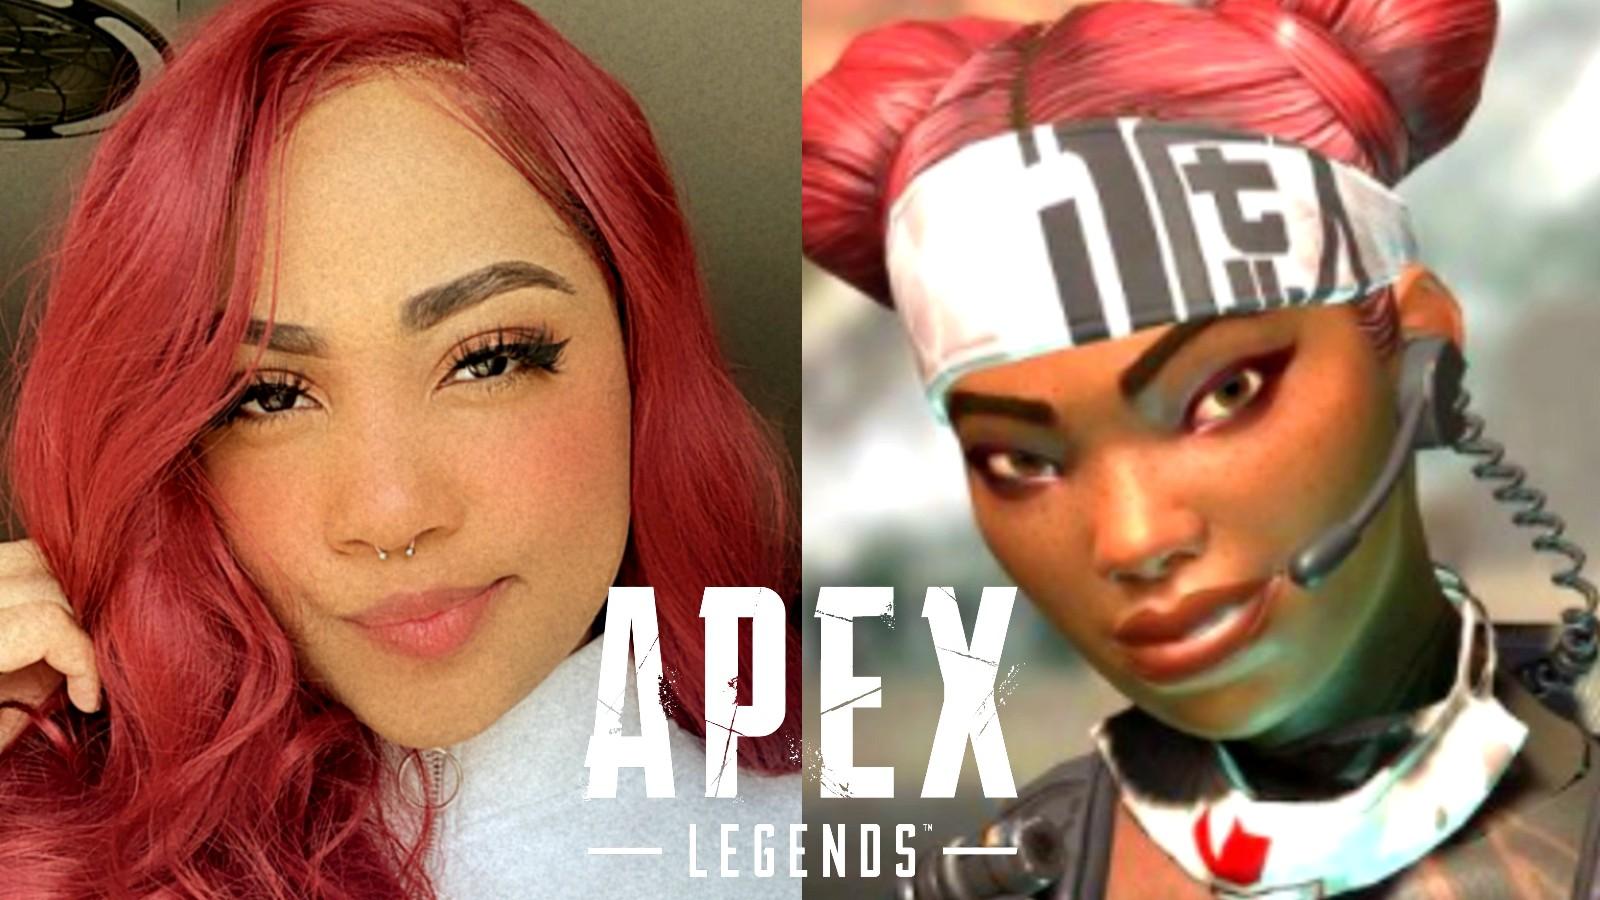 Apex Legends Liftetime next to cosplayer Ninjayla